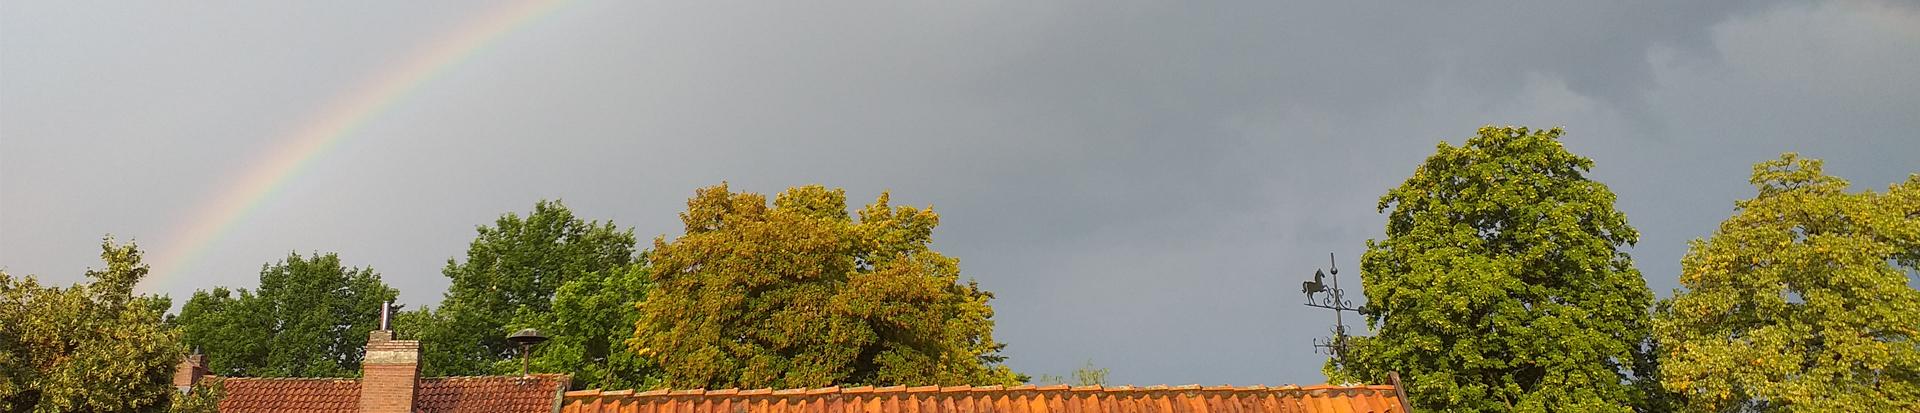 Regenbogen über Mardorf